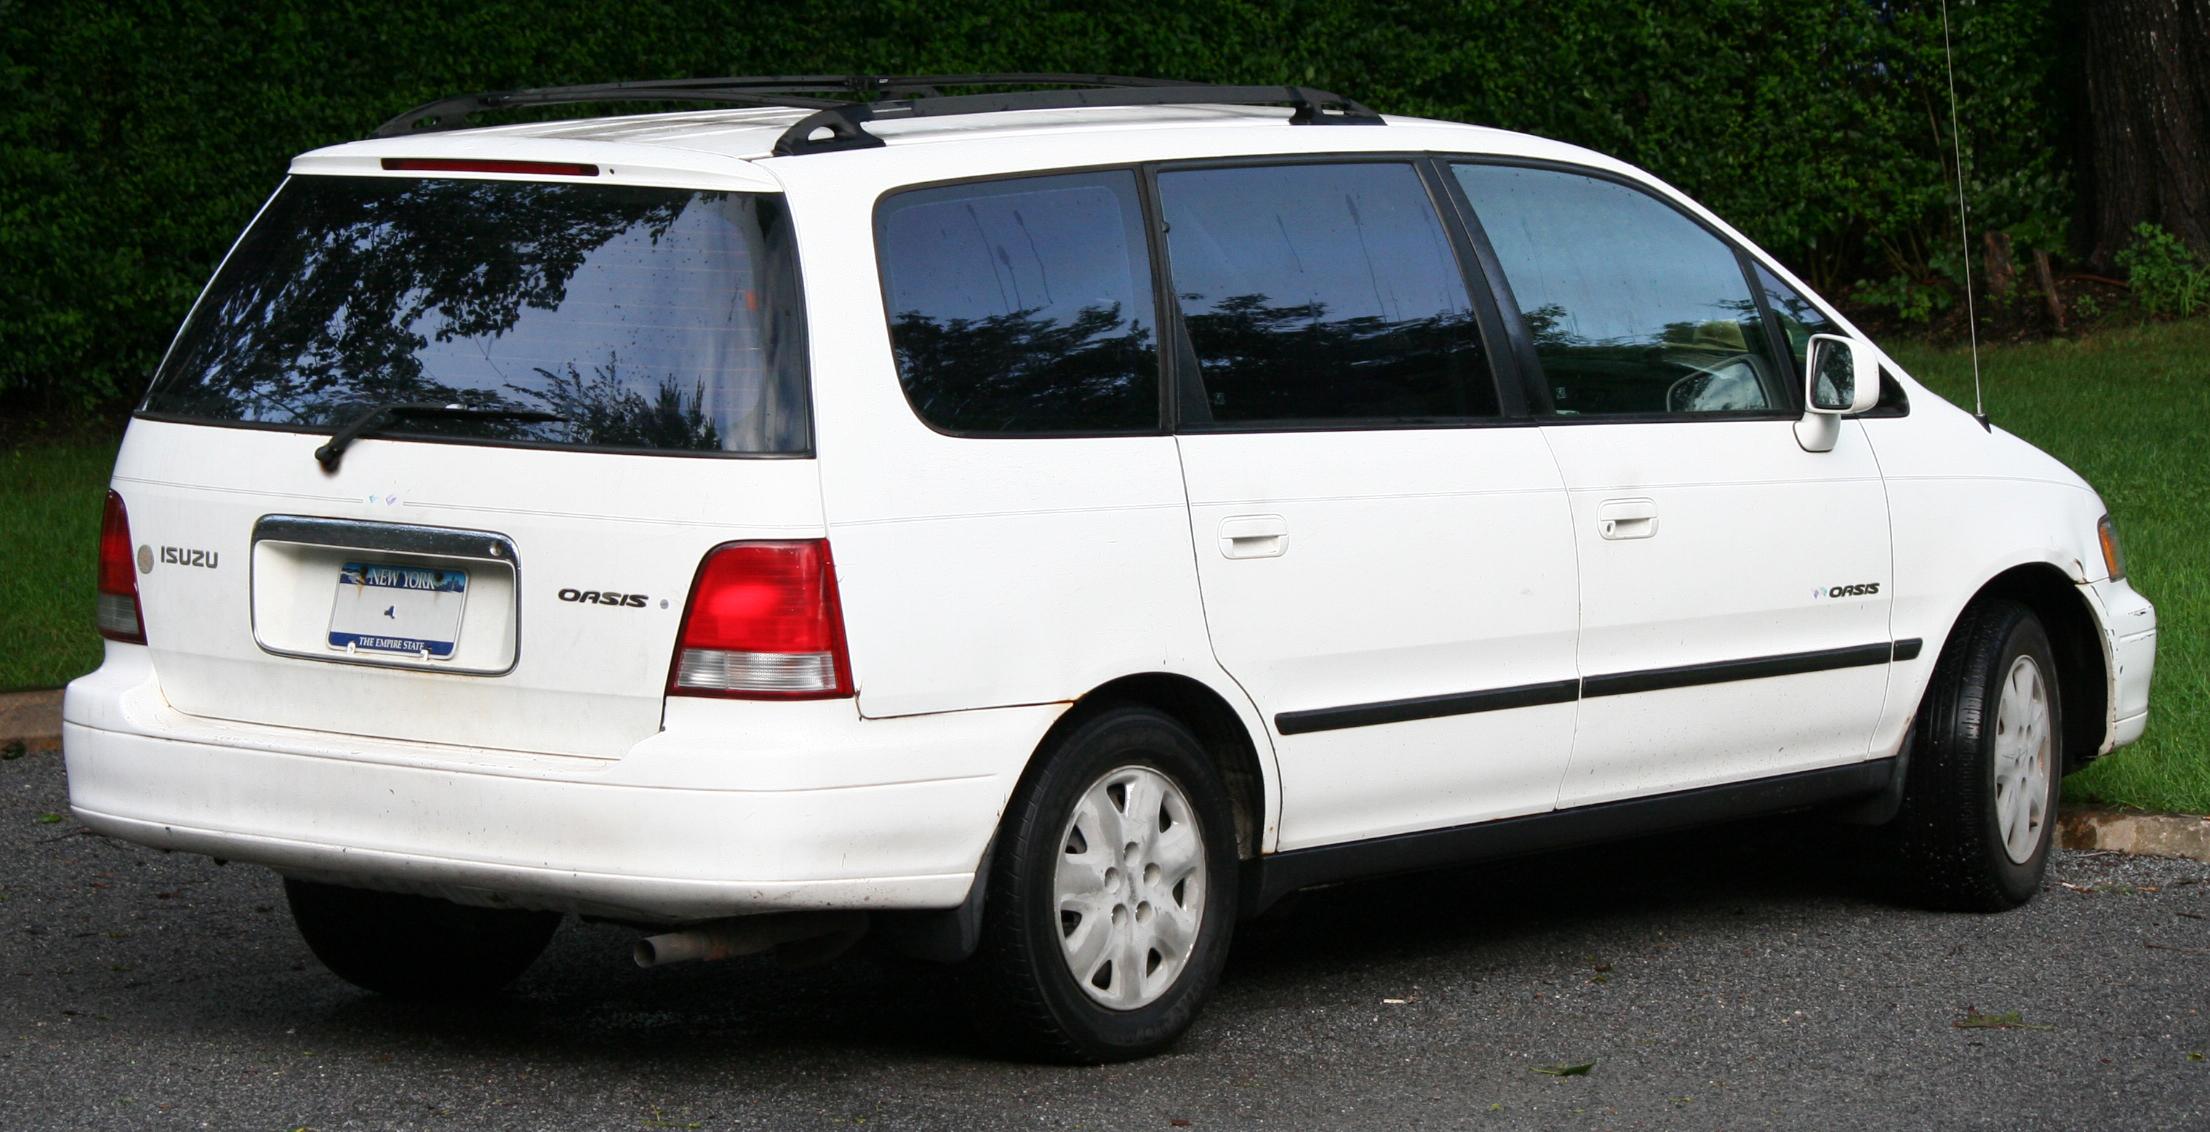 Honda 15400 Plm A02 Honda Acura Genuine Oil Filters Plm